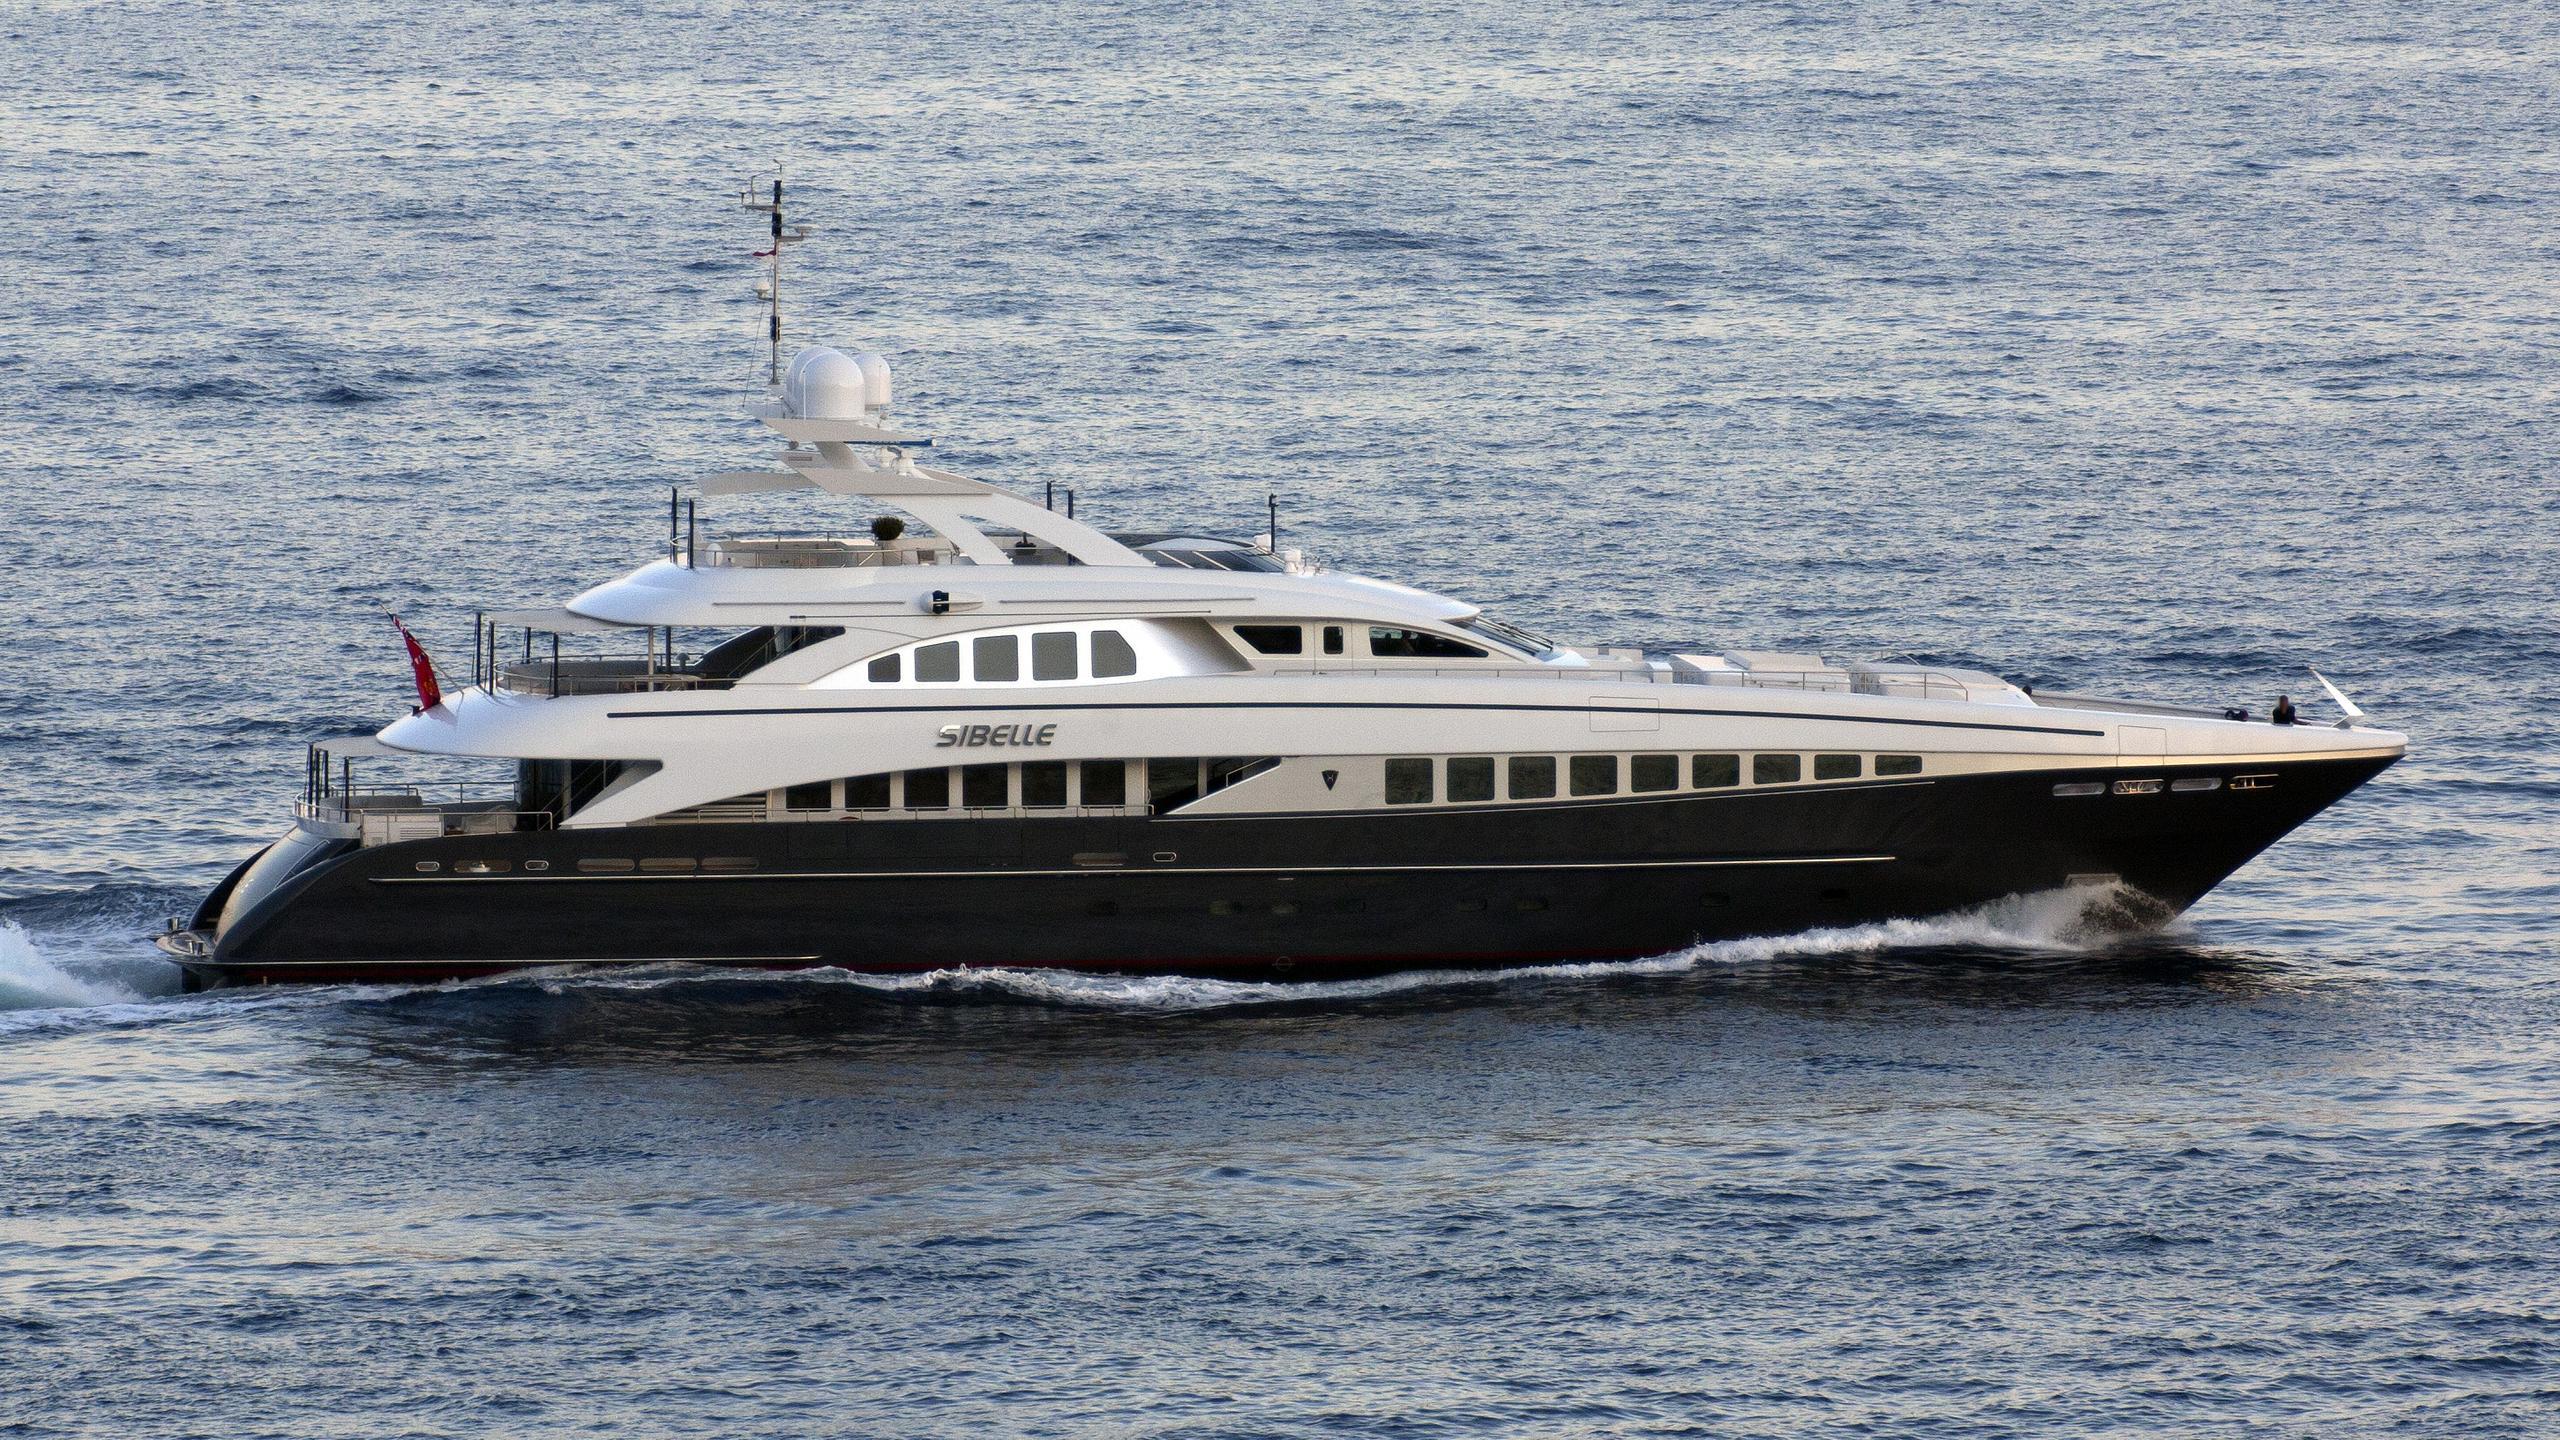 g3 sibelle motoryacht heesen yachts 44m 2008 cruising profile before refit